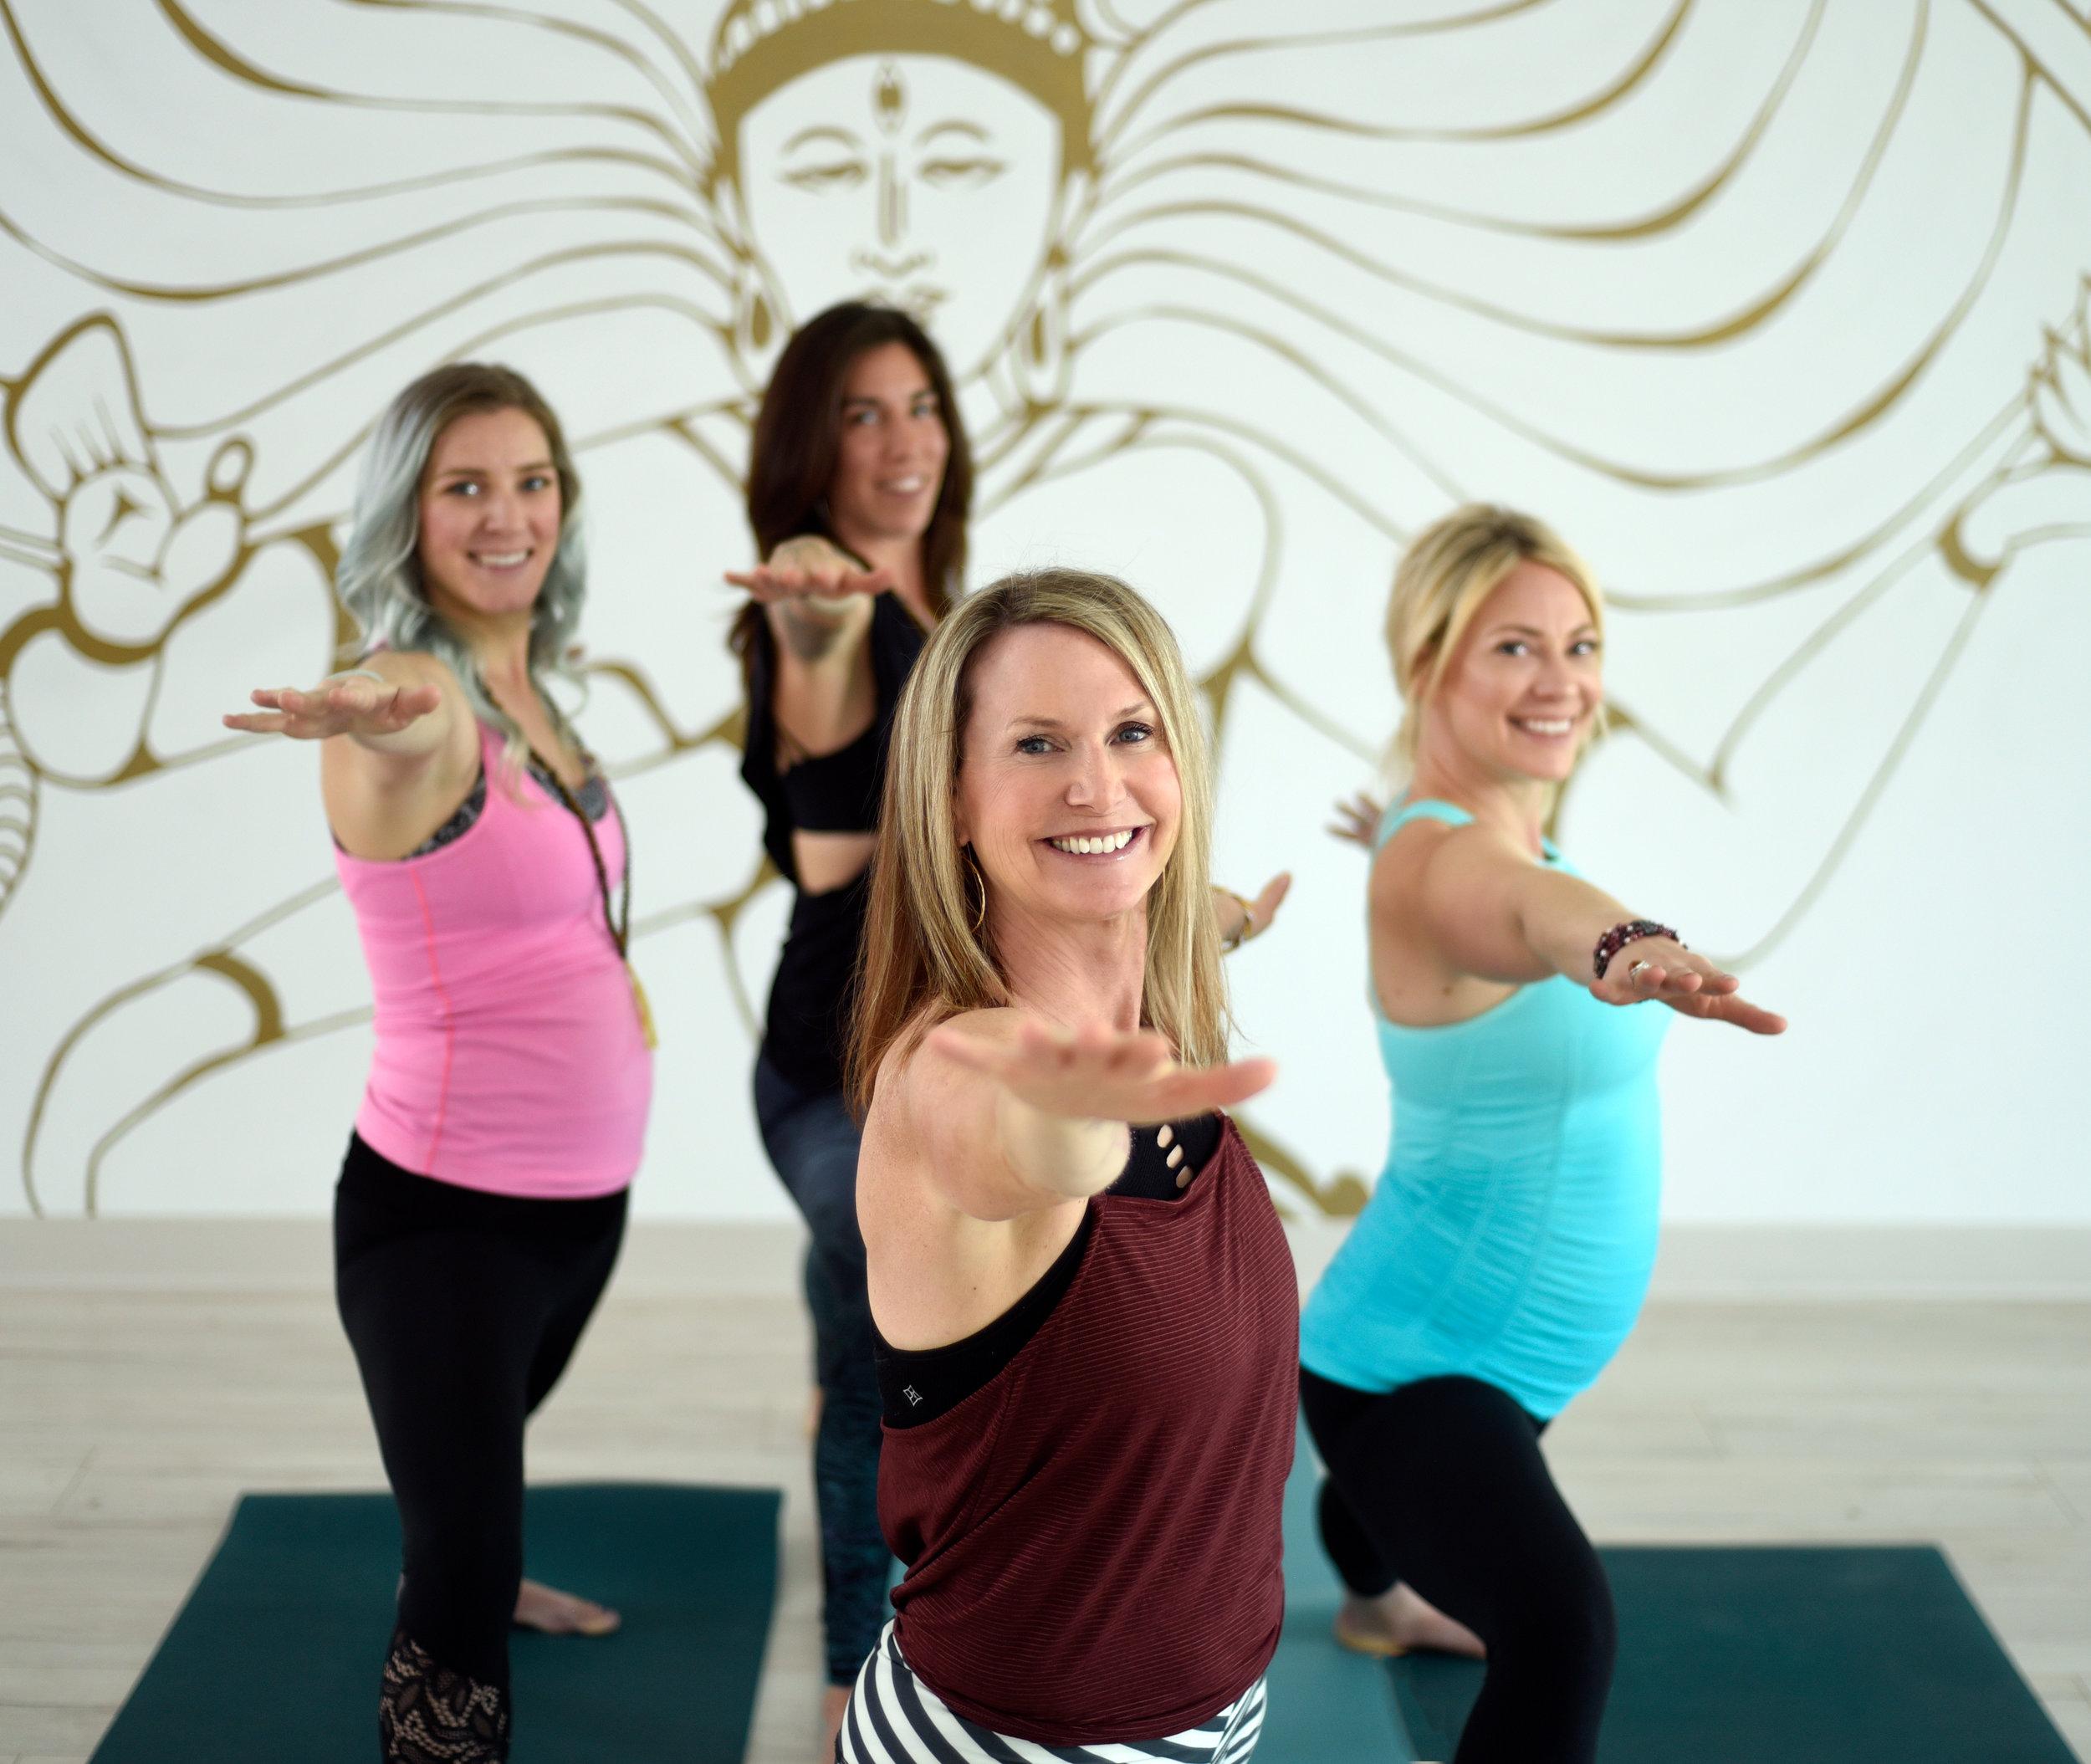 Awake-Yoga-warrior-2.jpg